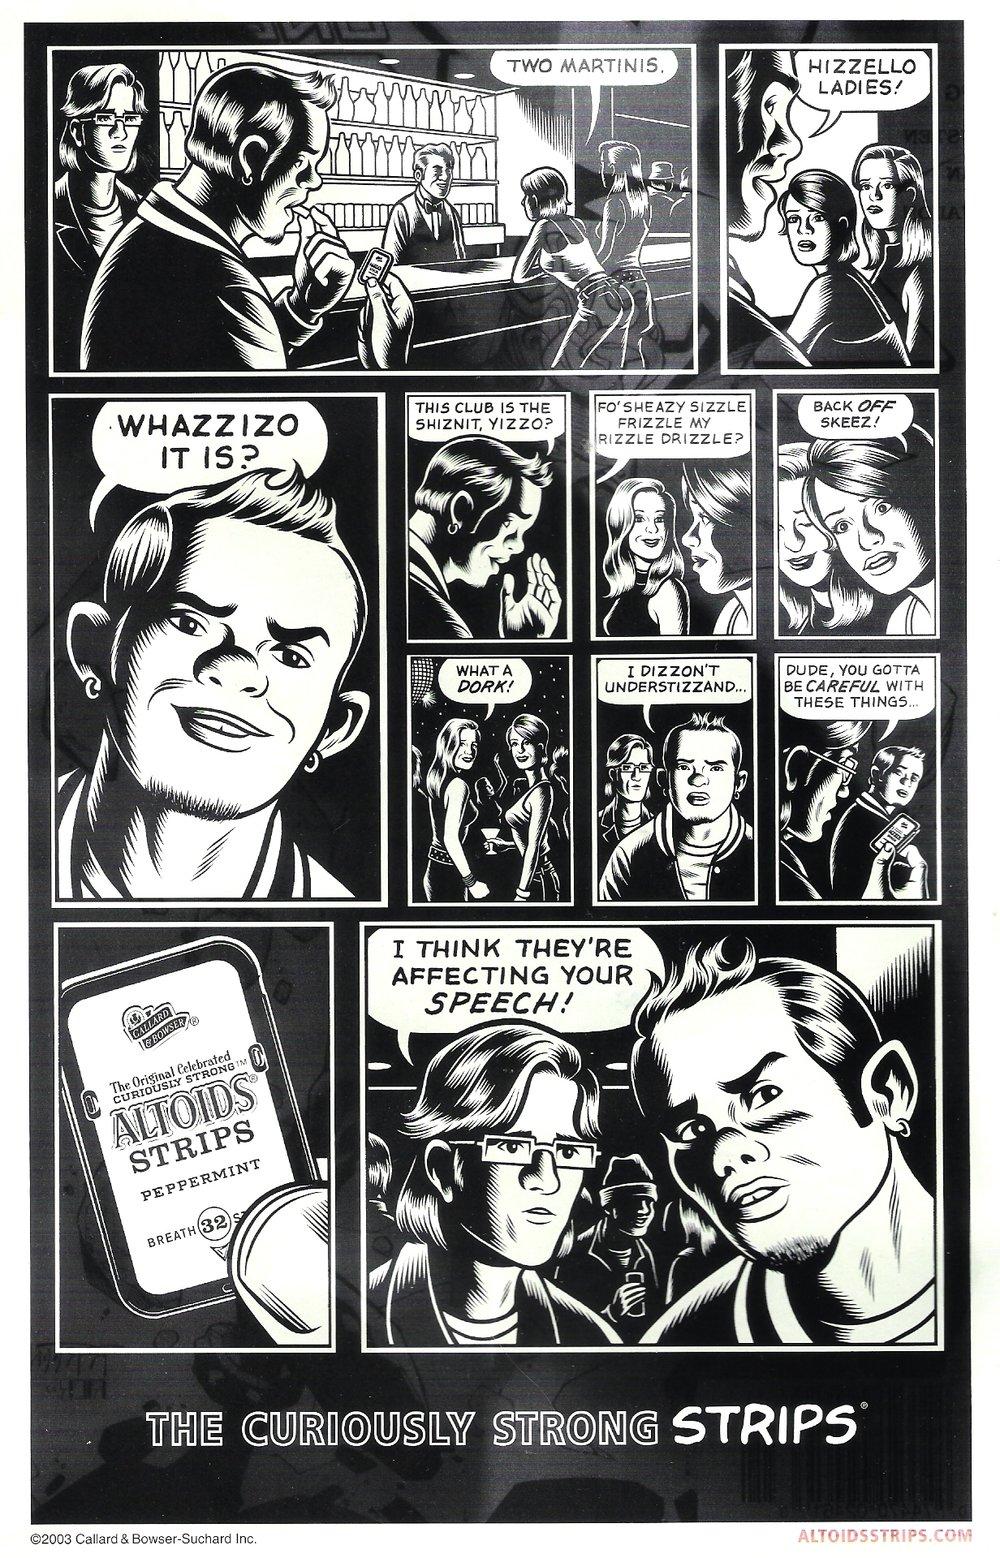 Altoids - Print (Comic Book)